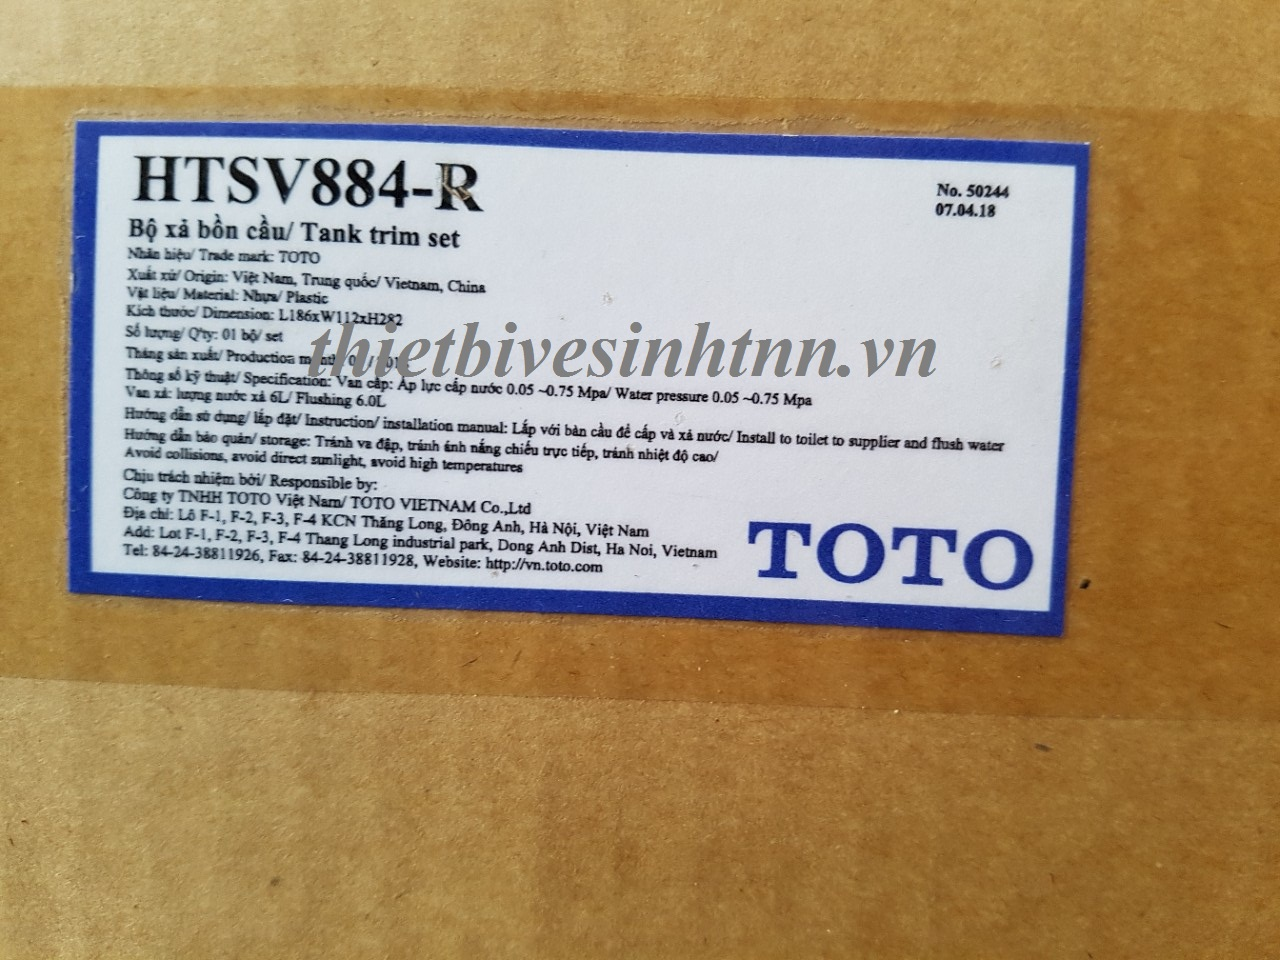 bo-xa-ban-cau-toto-HTSV884